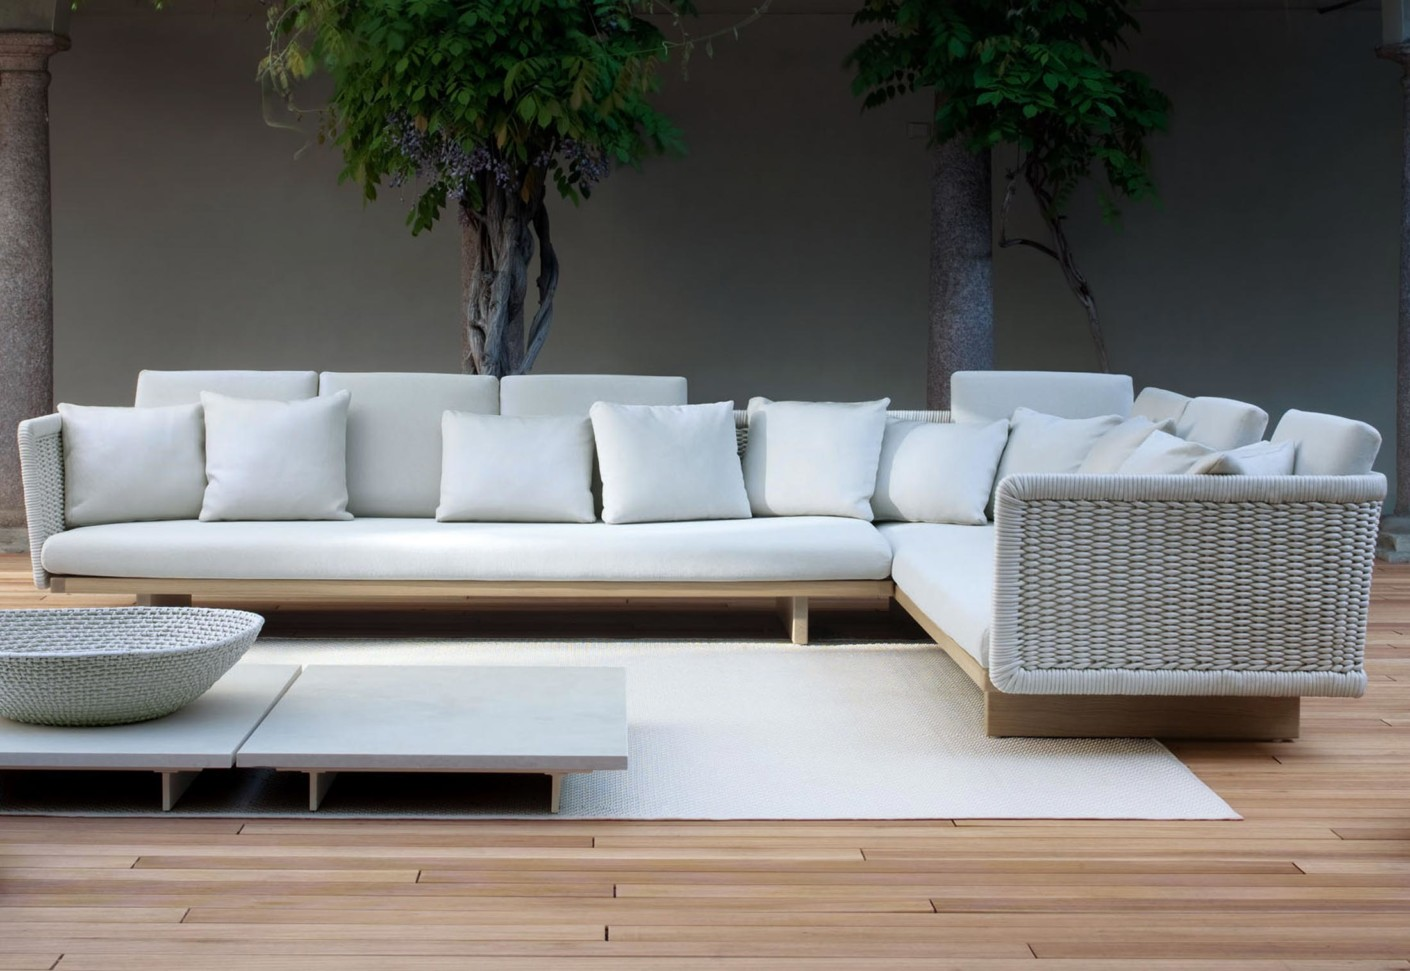 Sabi Sofa By Paola Lenti STYLEPARK